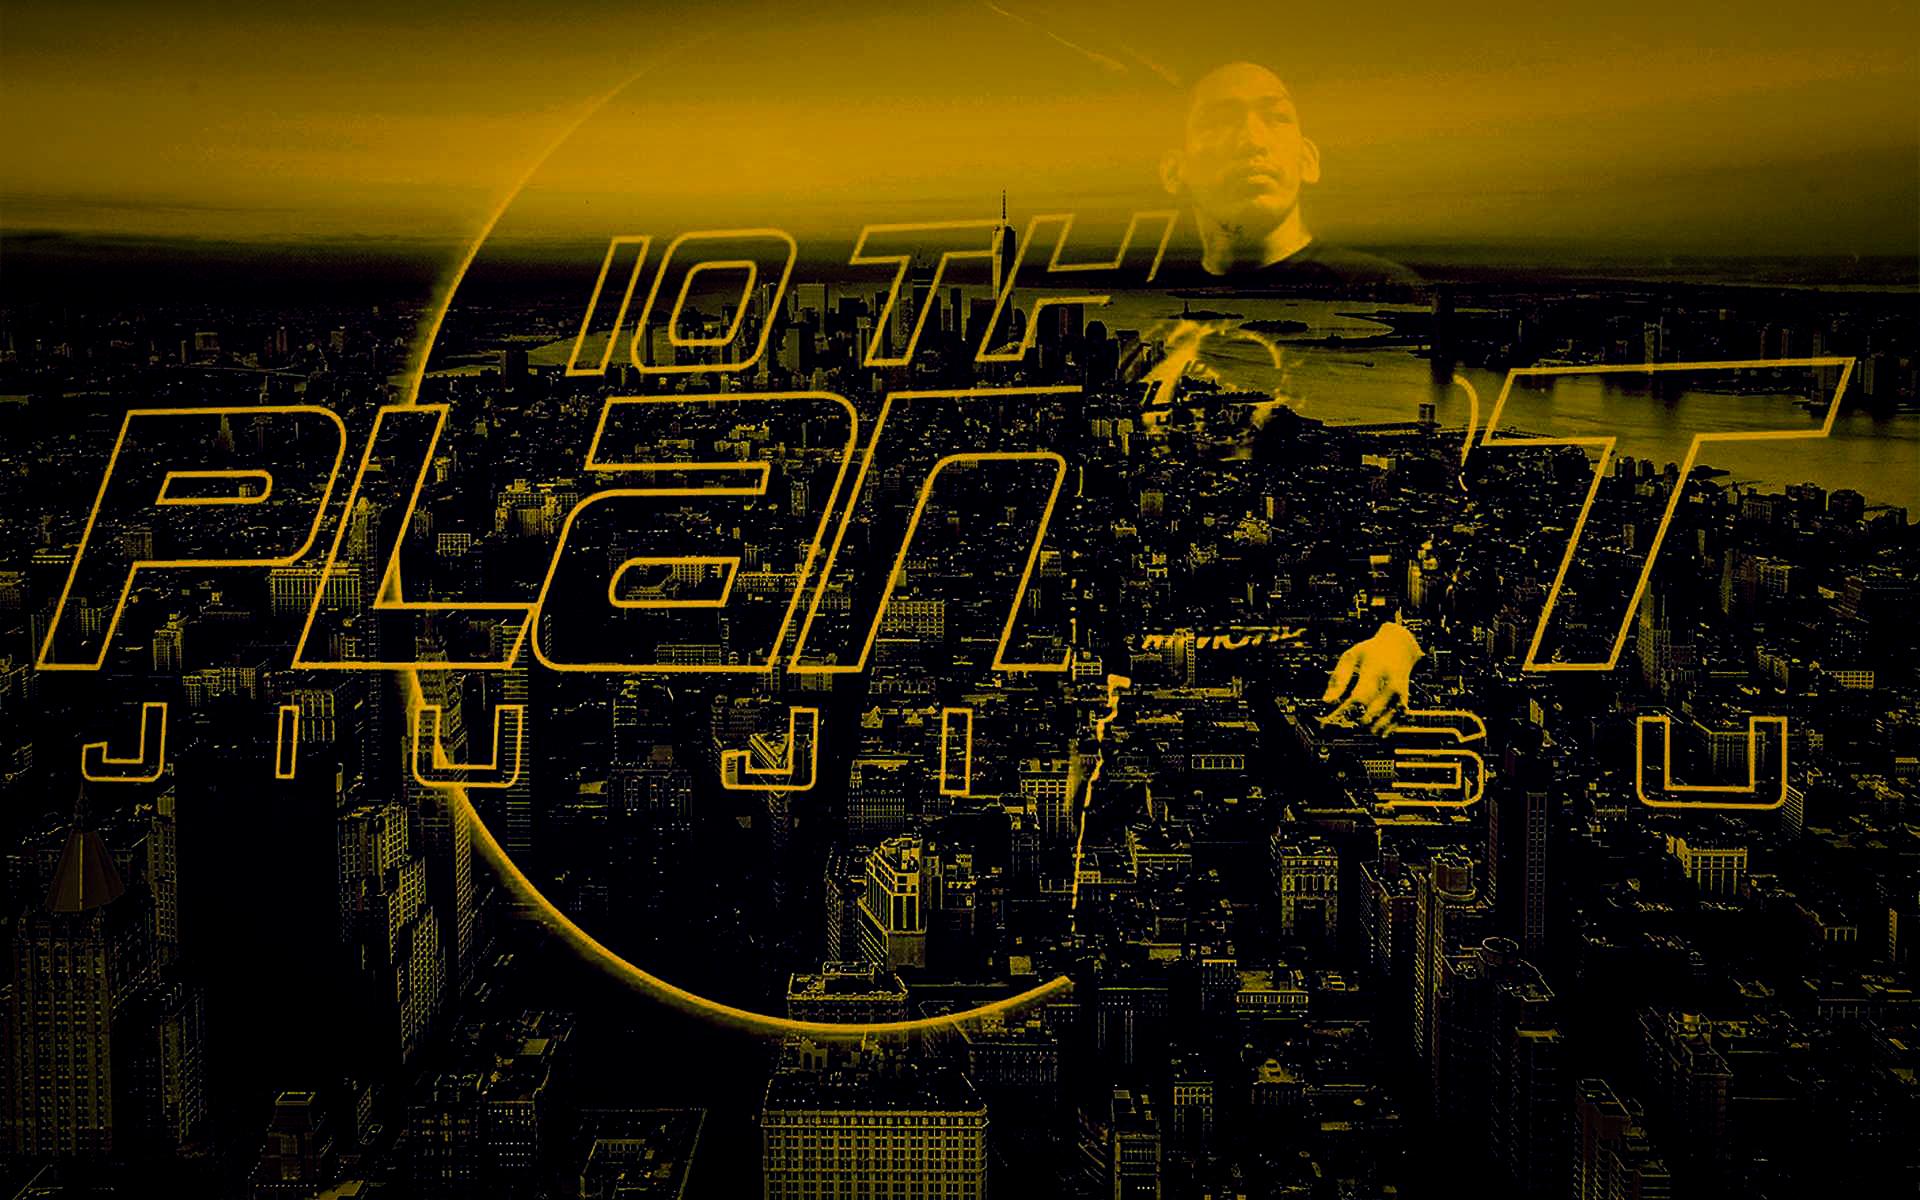 10th Planet NYC